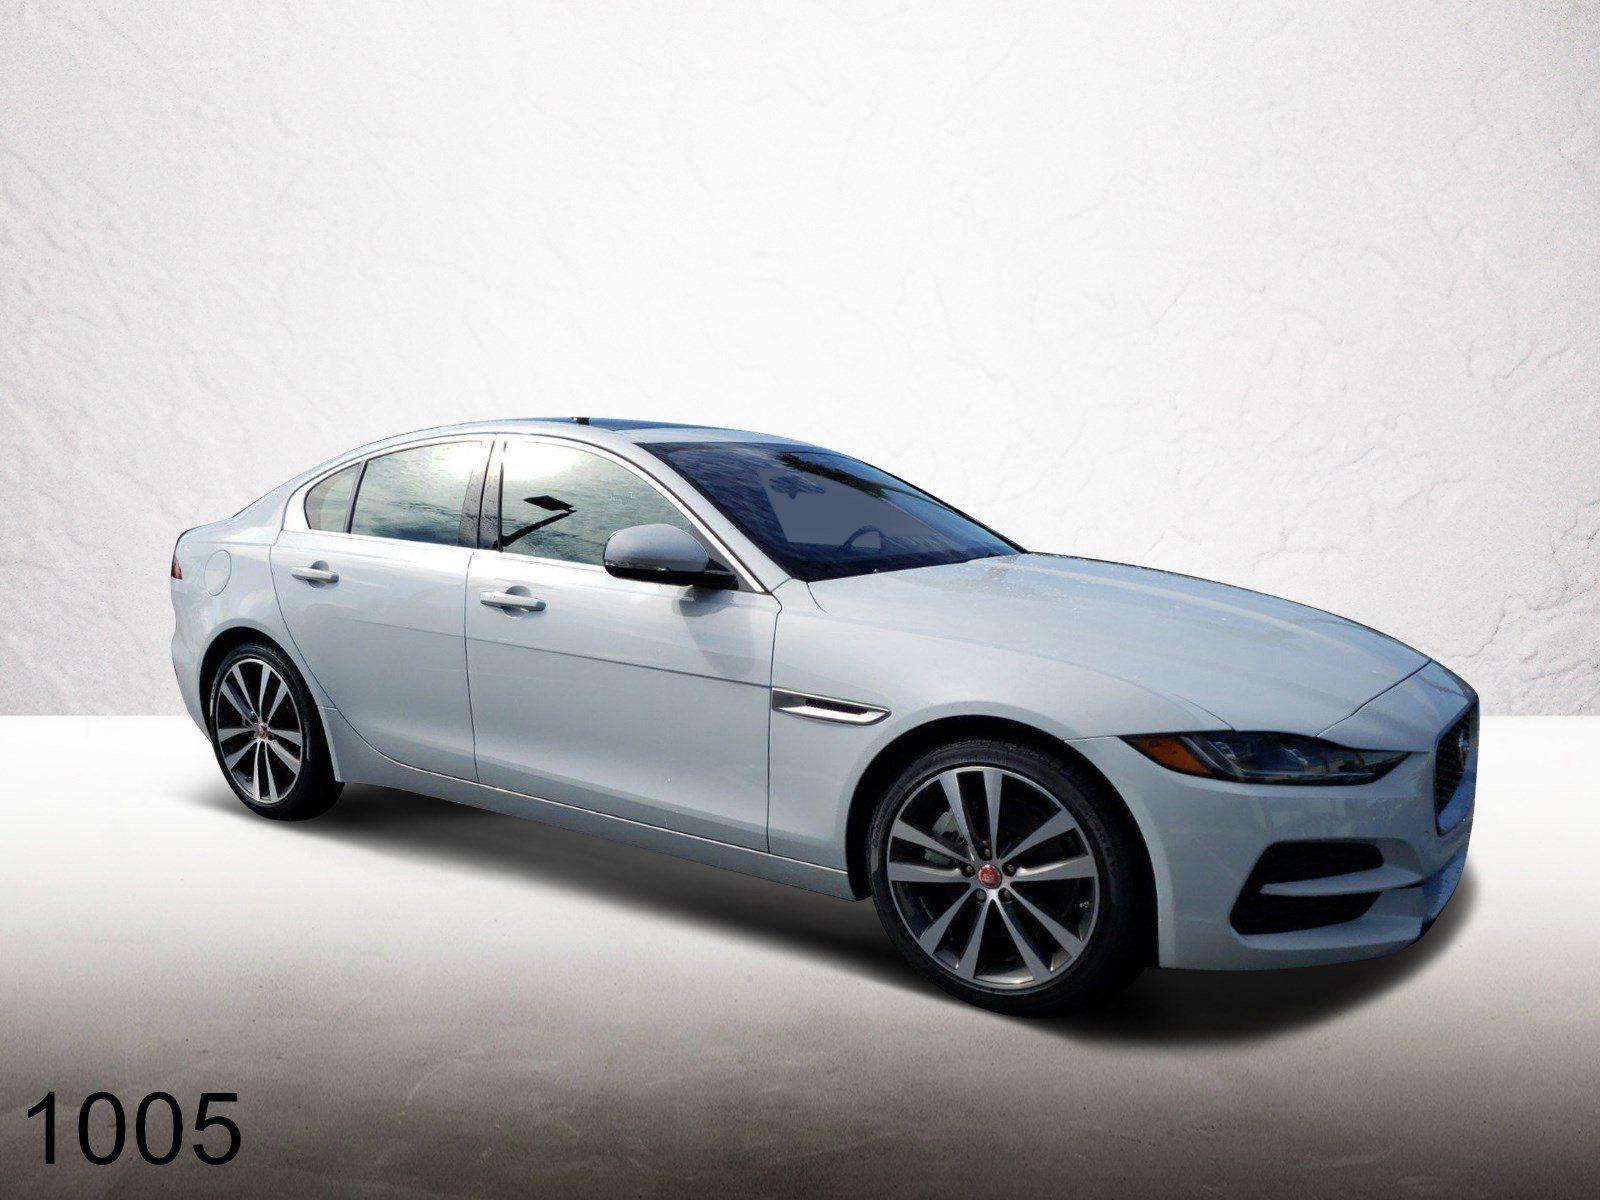 2020 All Jaguar Xe Sedan Wallpaper